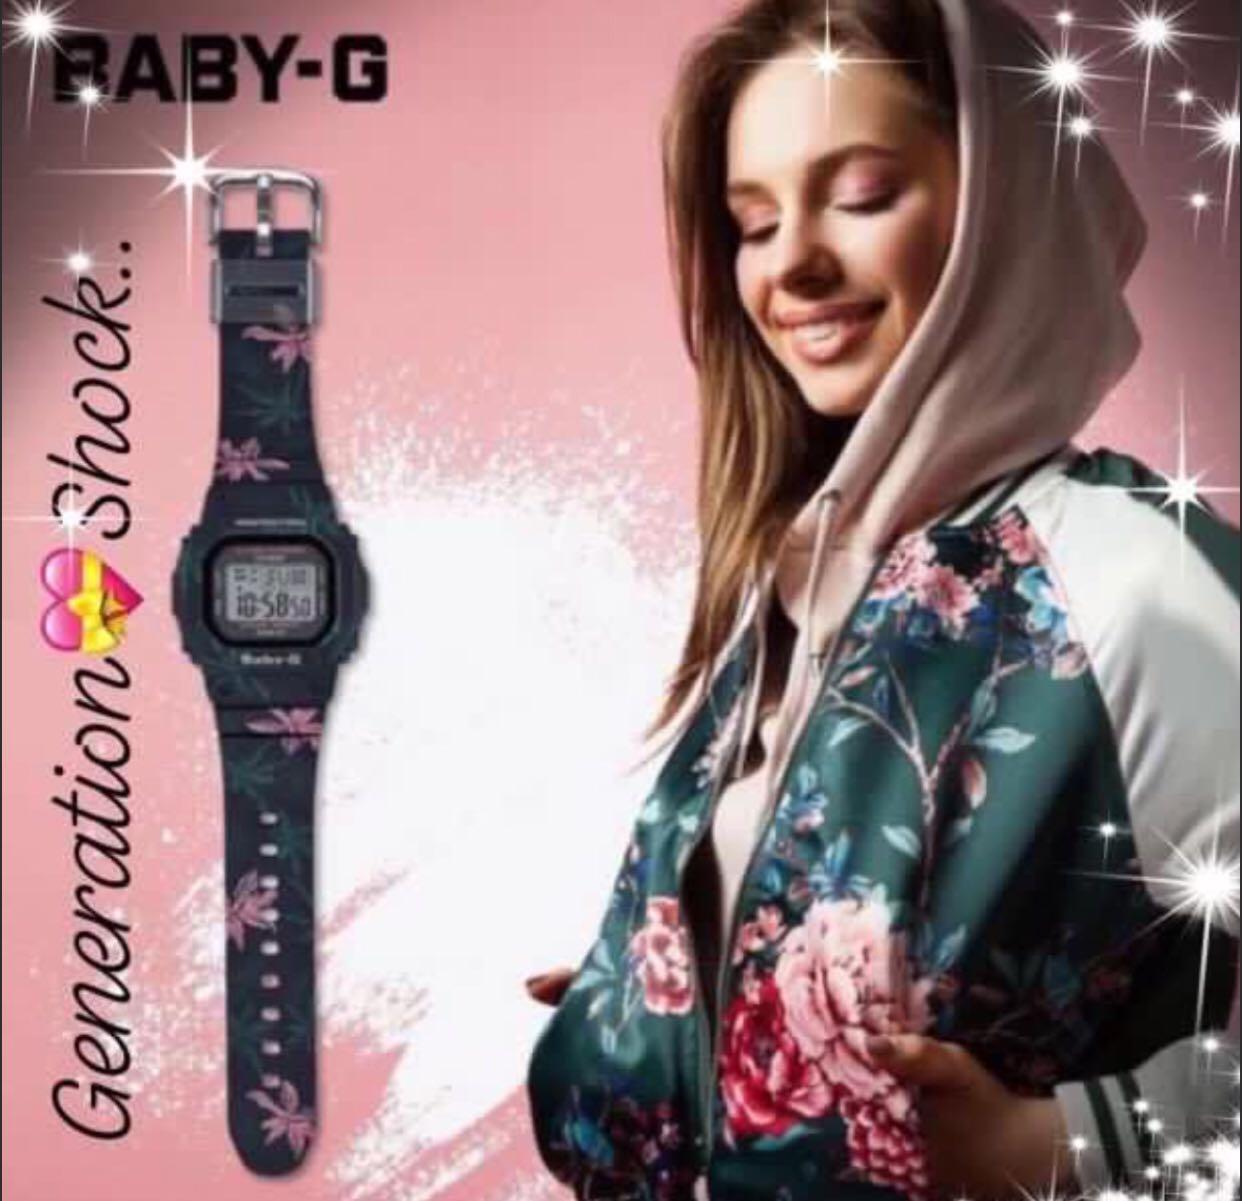 NEW🌟COUPLE💝SET : CASIO BABYG UNISEX SPORTS WATCH : 100% ORIGINAL AUTHENTIC : By BABY-G-SHOCK ( GSHOCK ) COMPANY : W-217HM-5AV+ BGD-560CF-1